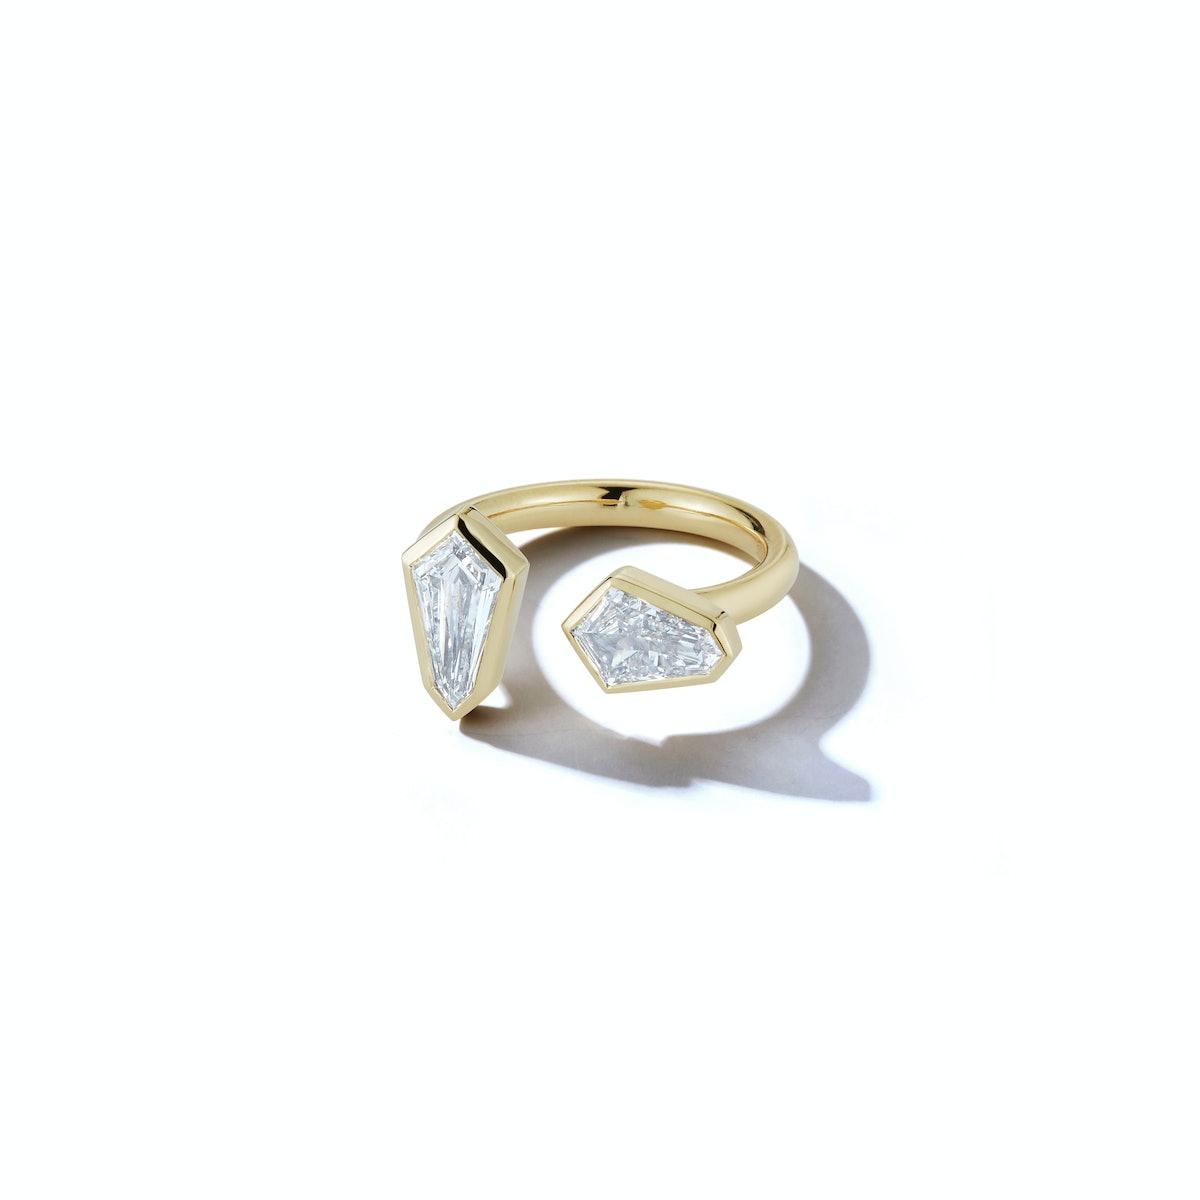 Double Shield Open Ring